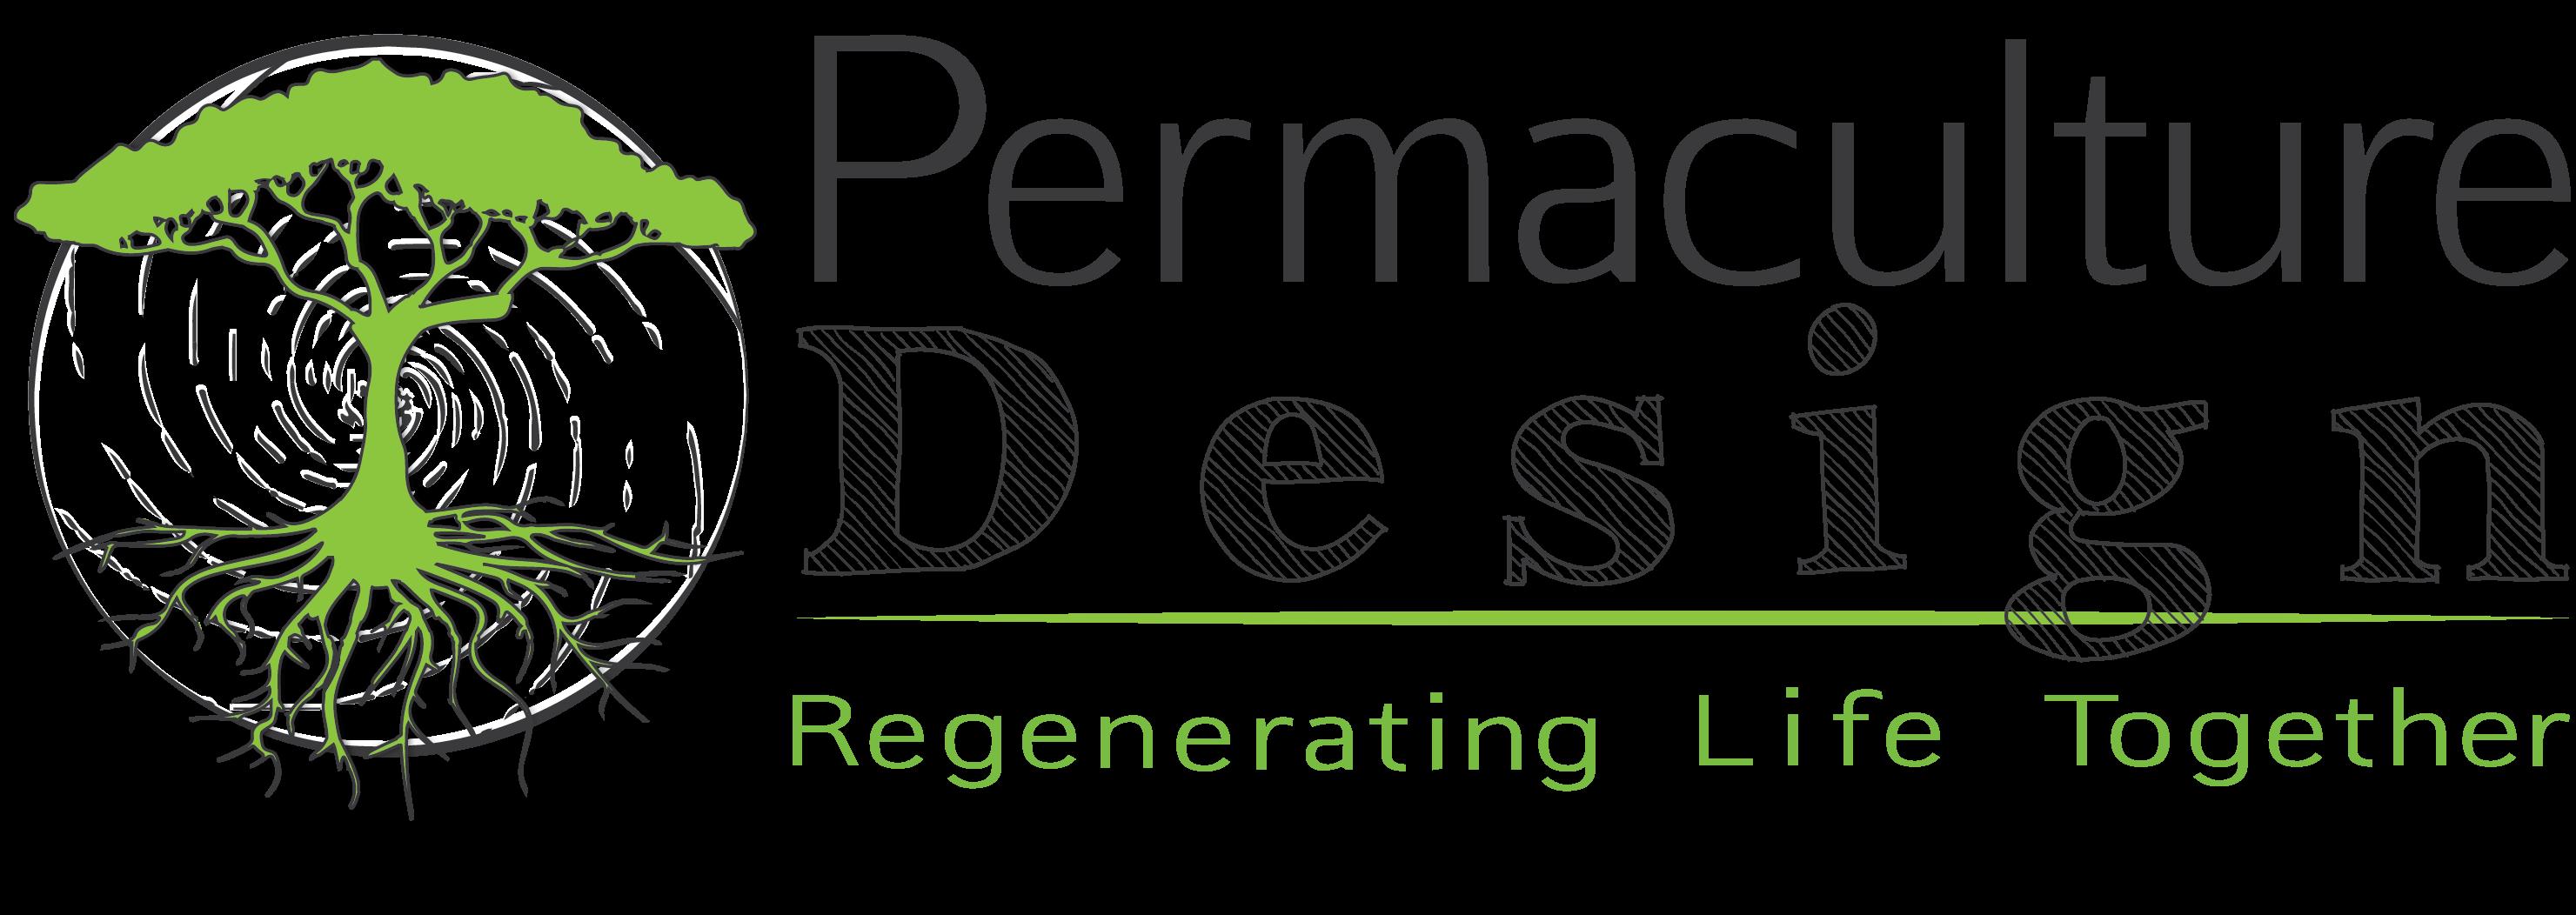 Permi Mag Logo FINAL 1